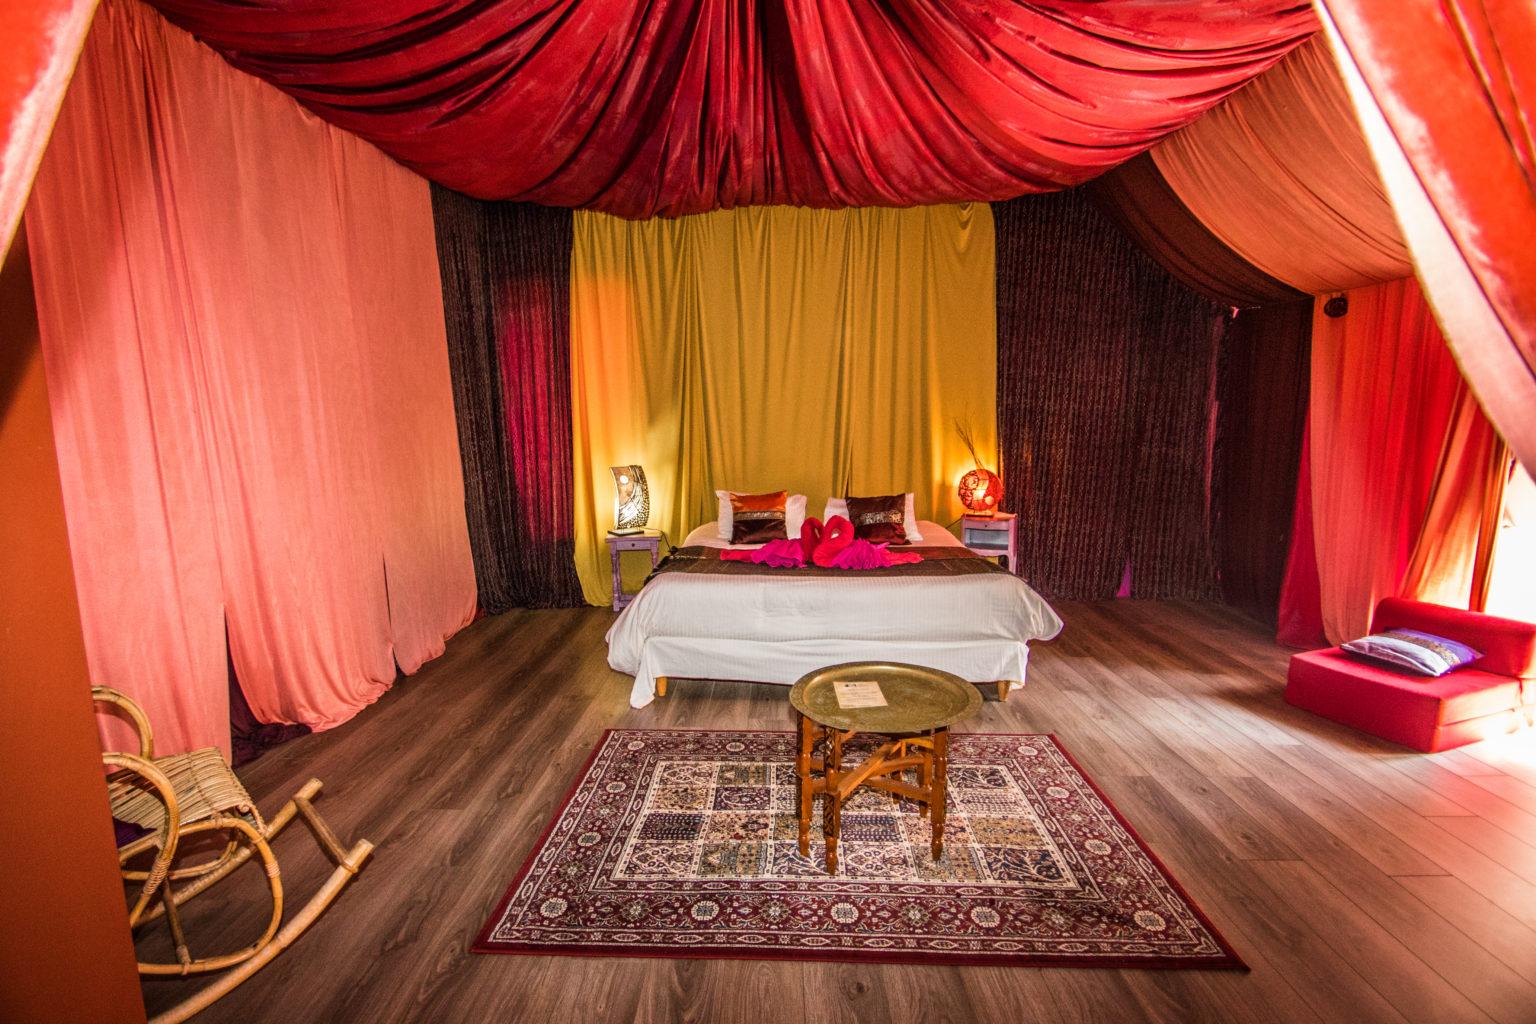 LA FONT VINEUSE HOTEL & SPA - HEBERGEMENT CHARME & INSOLITE 2019-0061LA FONT VINEUSE HOTEL & SPA